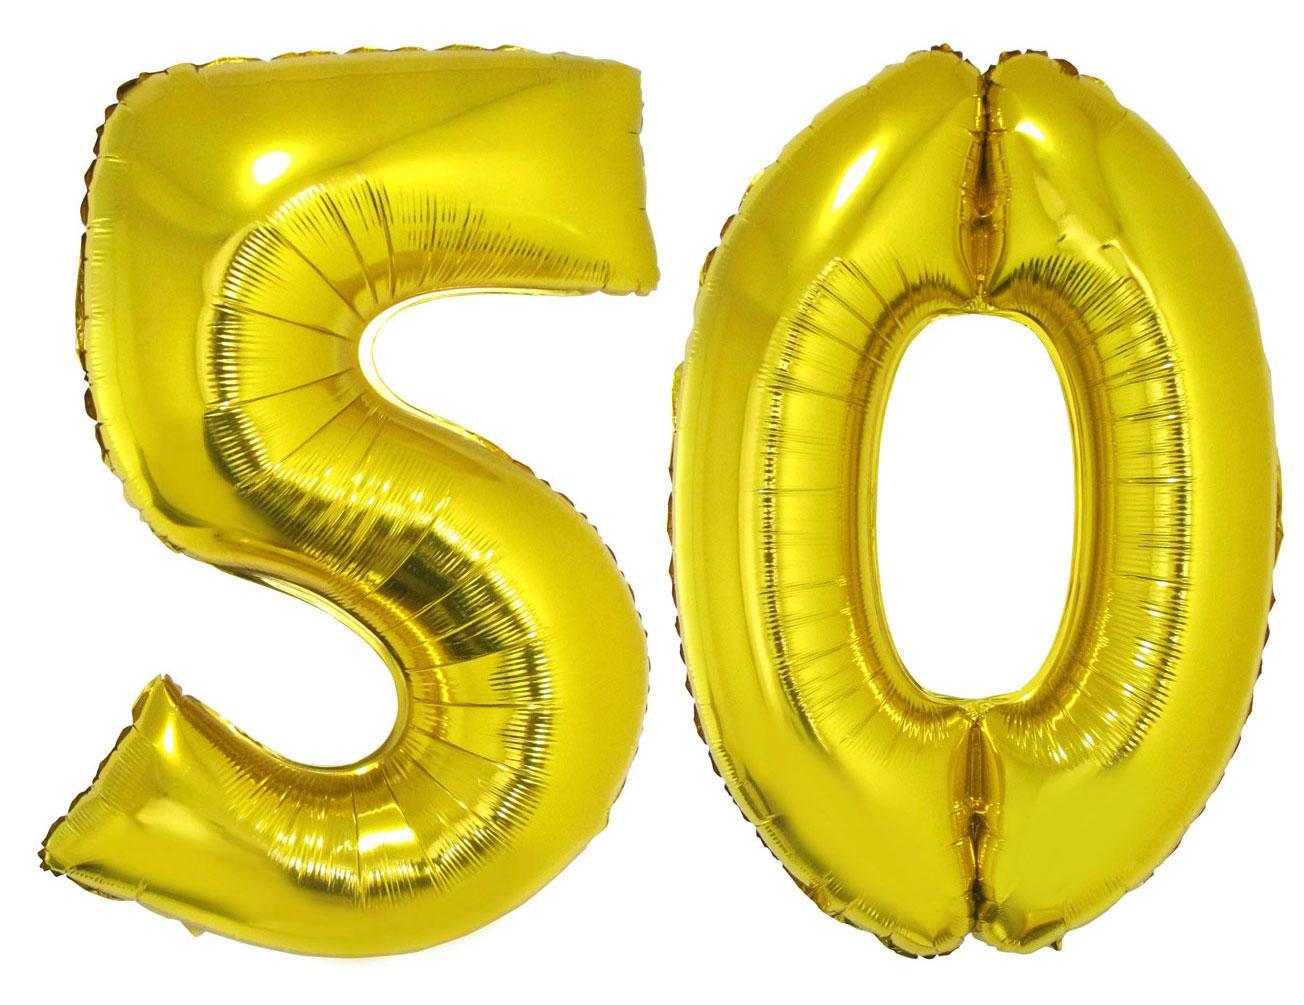 Folienballons Luftballon Set Goldene Hochzeit 50 Jahre Xxl Party Dekoration